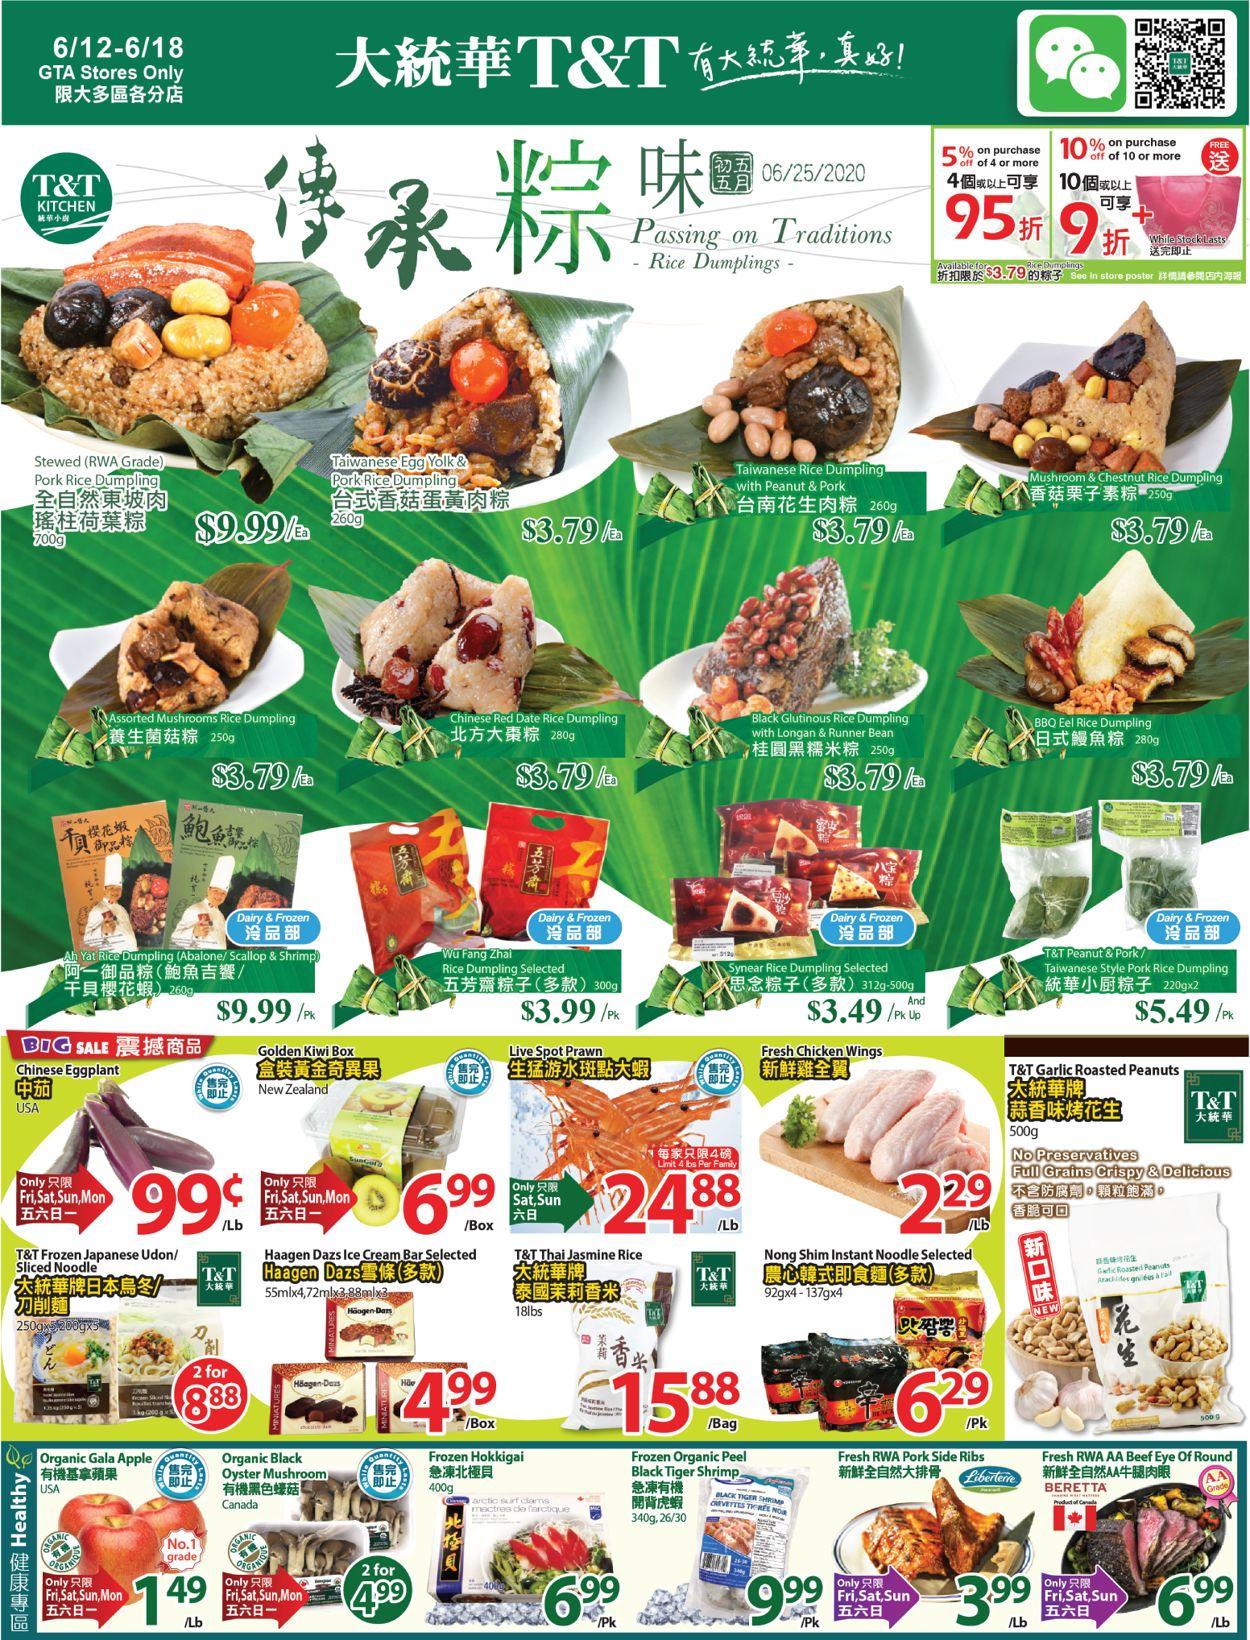 T&T Supermarket Flyer - 06/12-06/18/2020